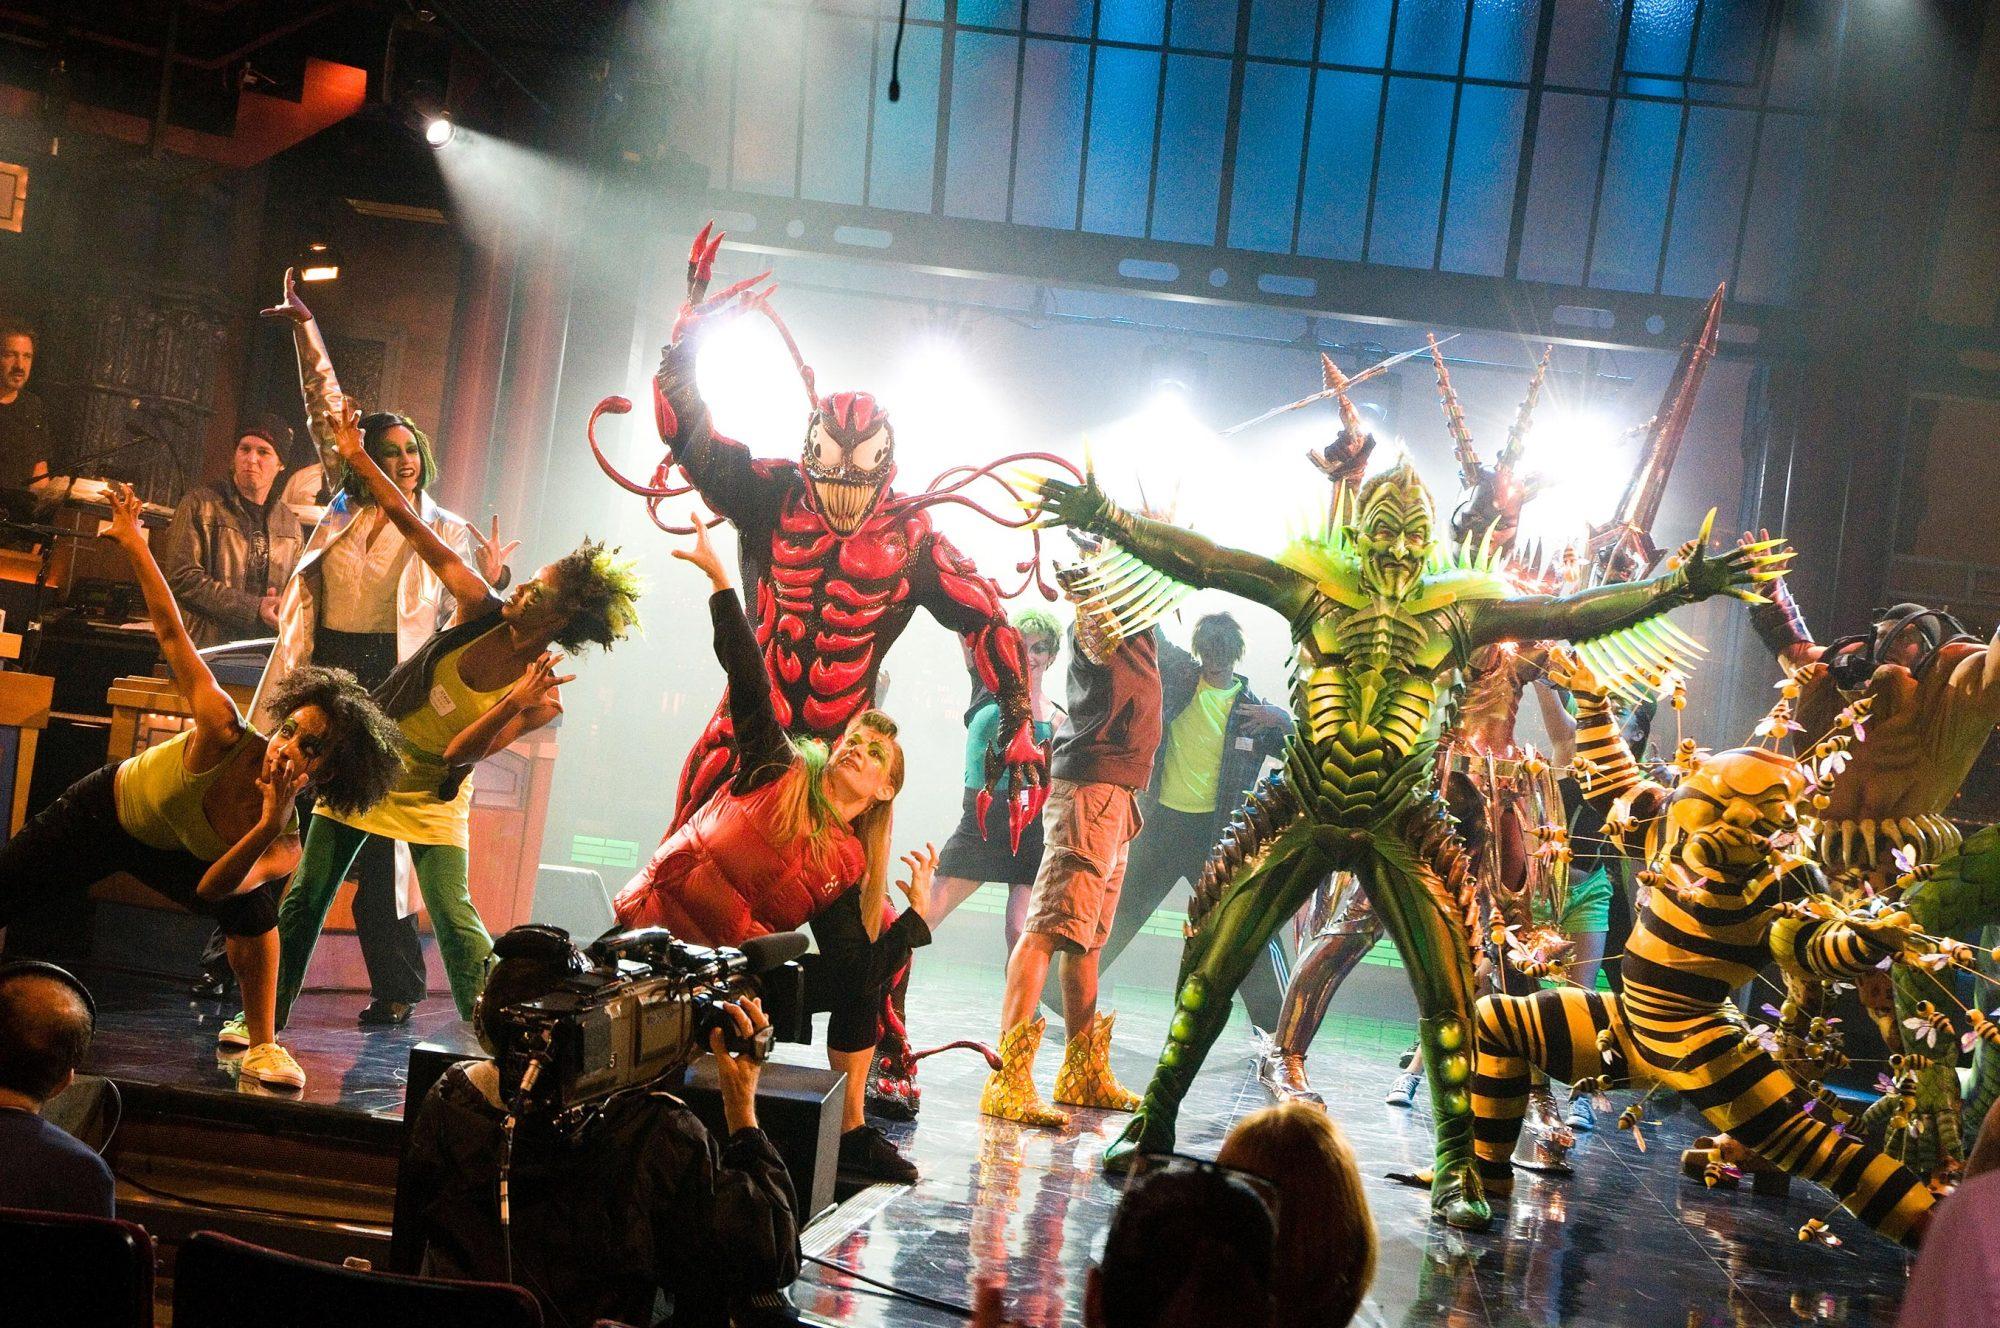 Celebrities Visit Broadway - July 18, 2011